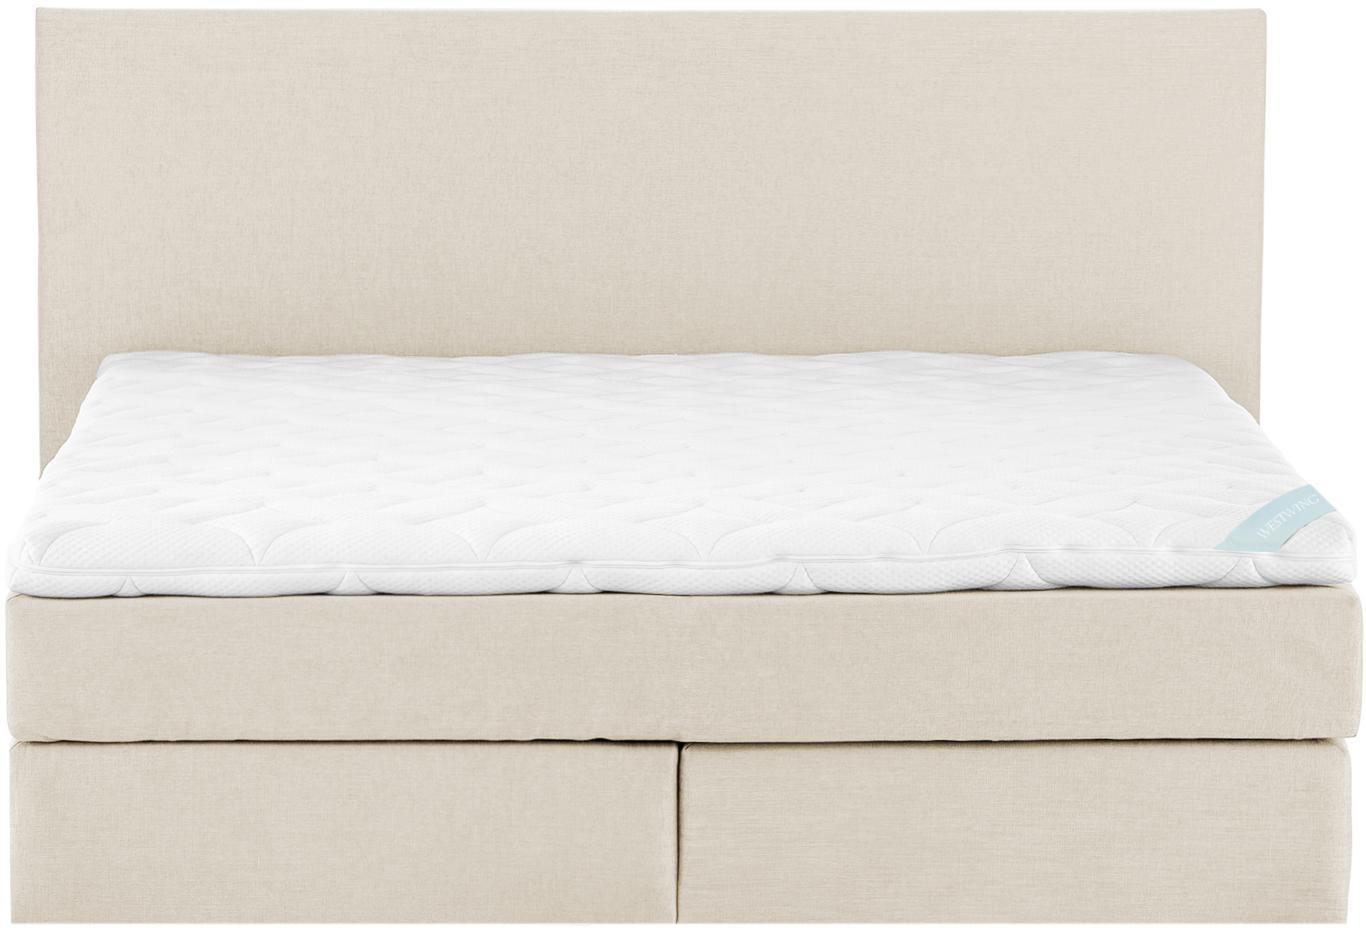 Premium Boxspringbett Eliza, Matratze: 7-Zonen-Taschenfederkern , Füße: Massives Buchenholz, lack, Beige, 200 x 200 cm